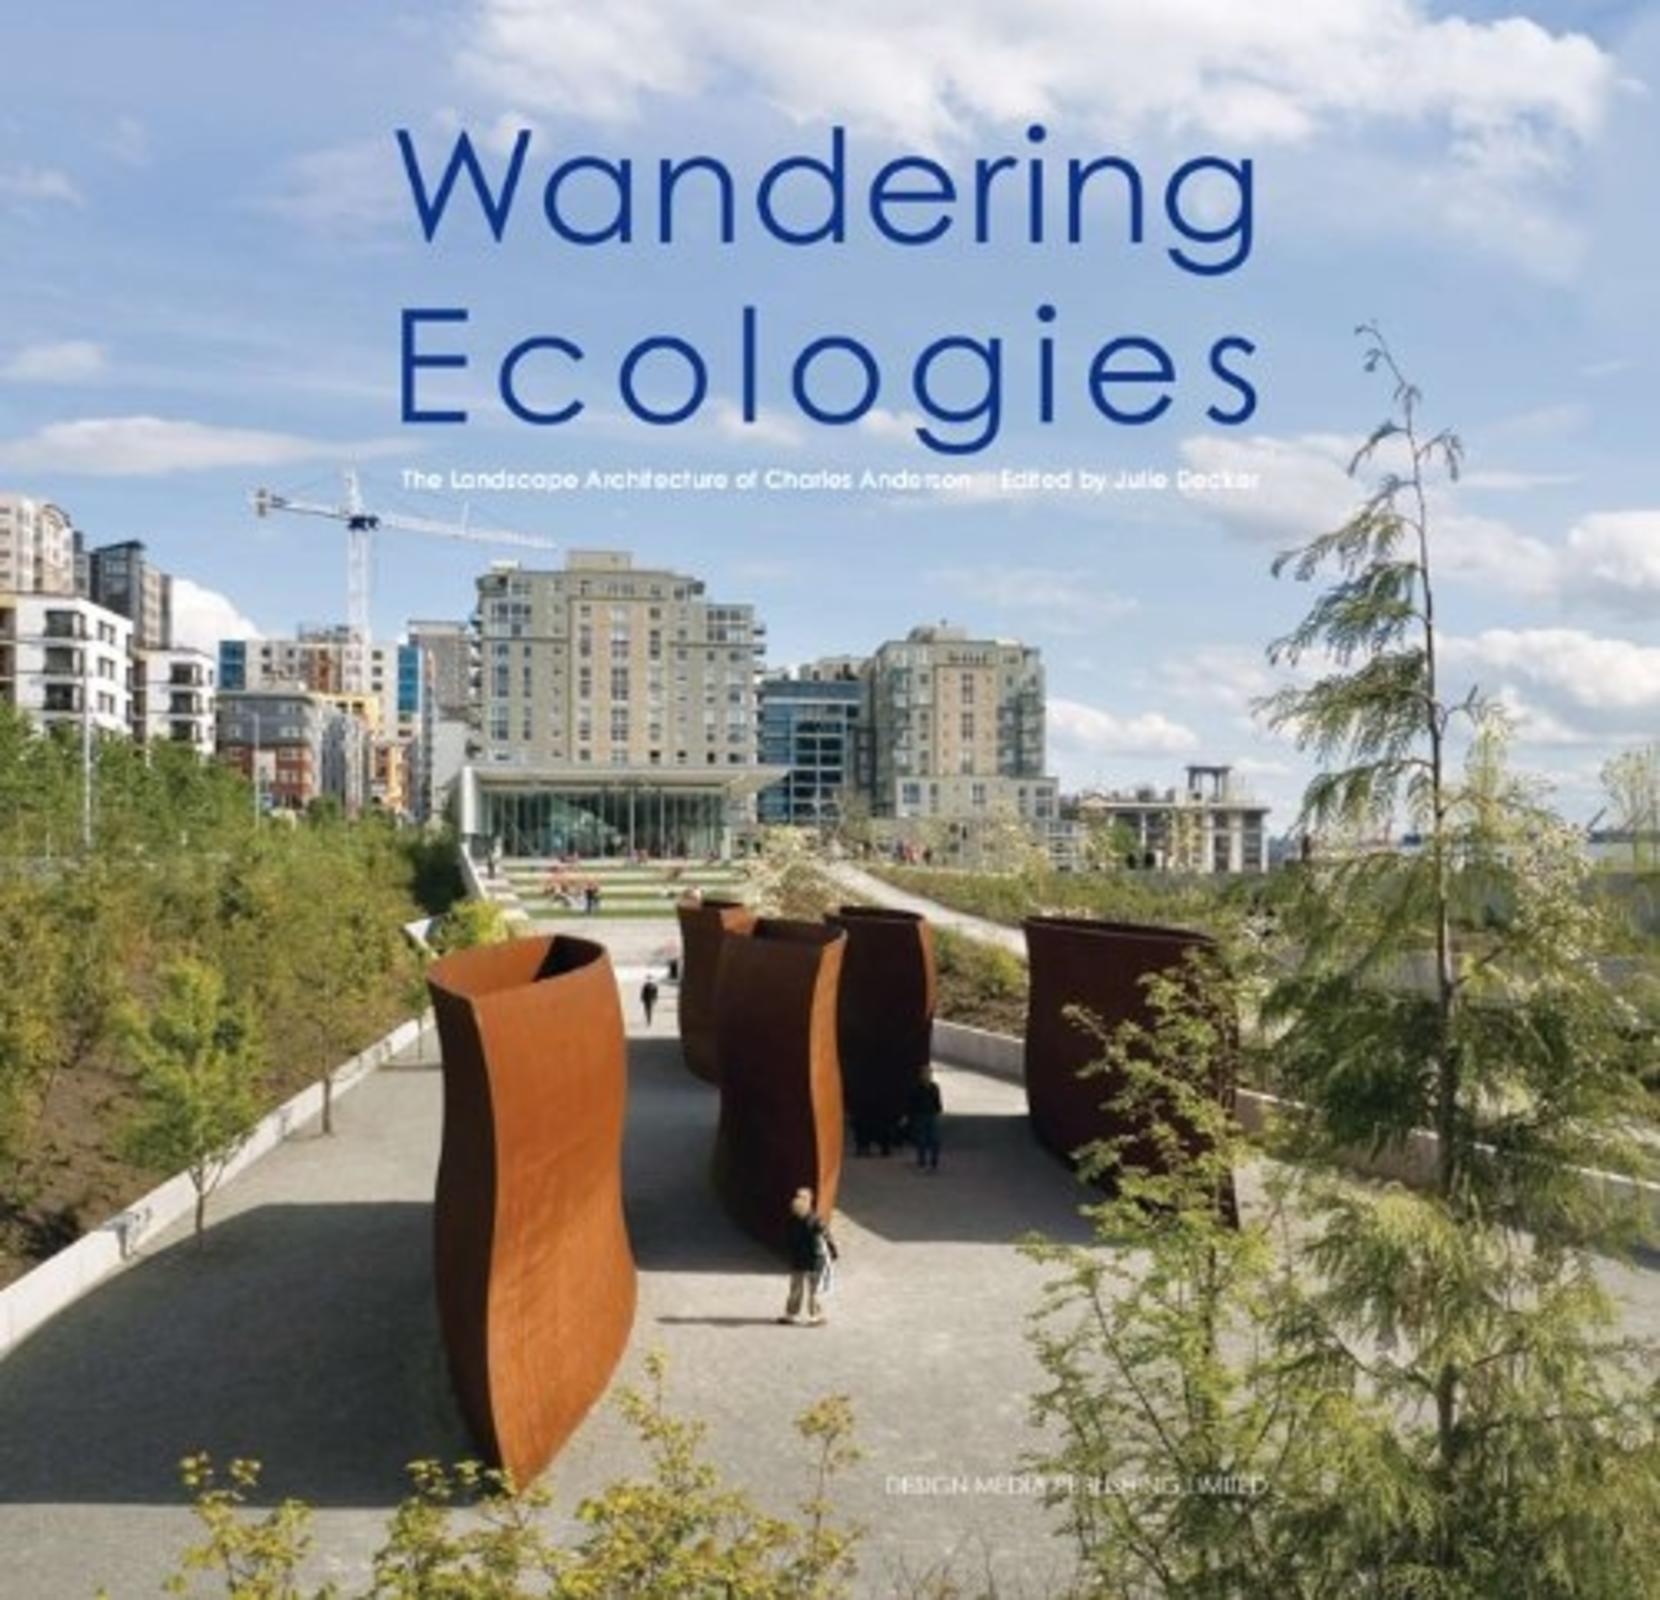 WANDERING ECOLOGIES. A PLANTSMAN'S JOURNEY. THE LANDSCAPE ARCHITECTURE OF CHARLE - A PLANTSMAN'S JOU